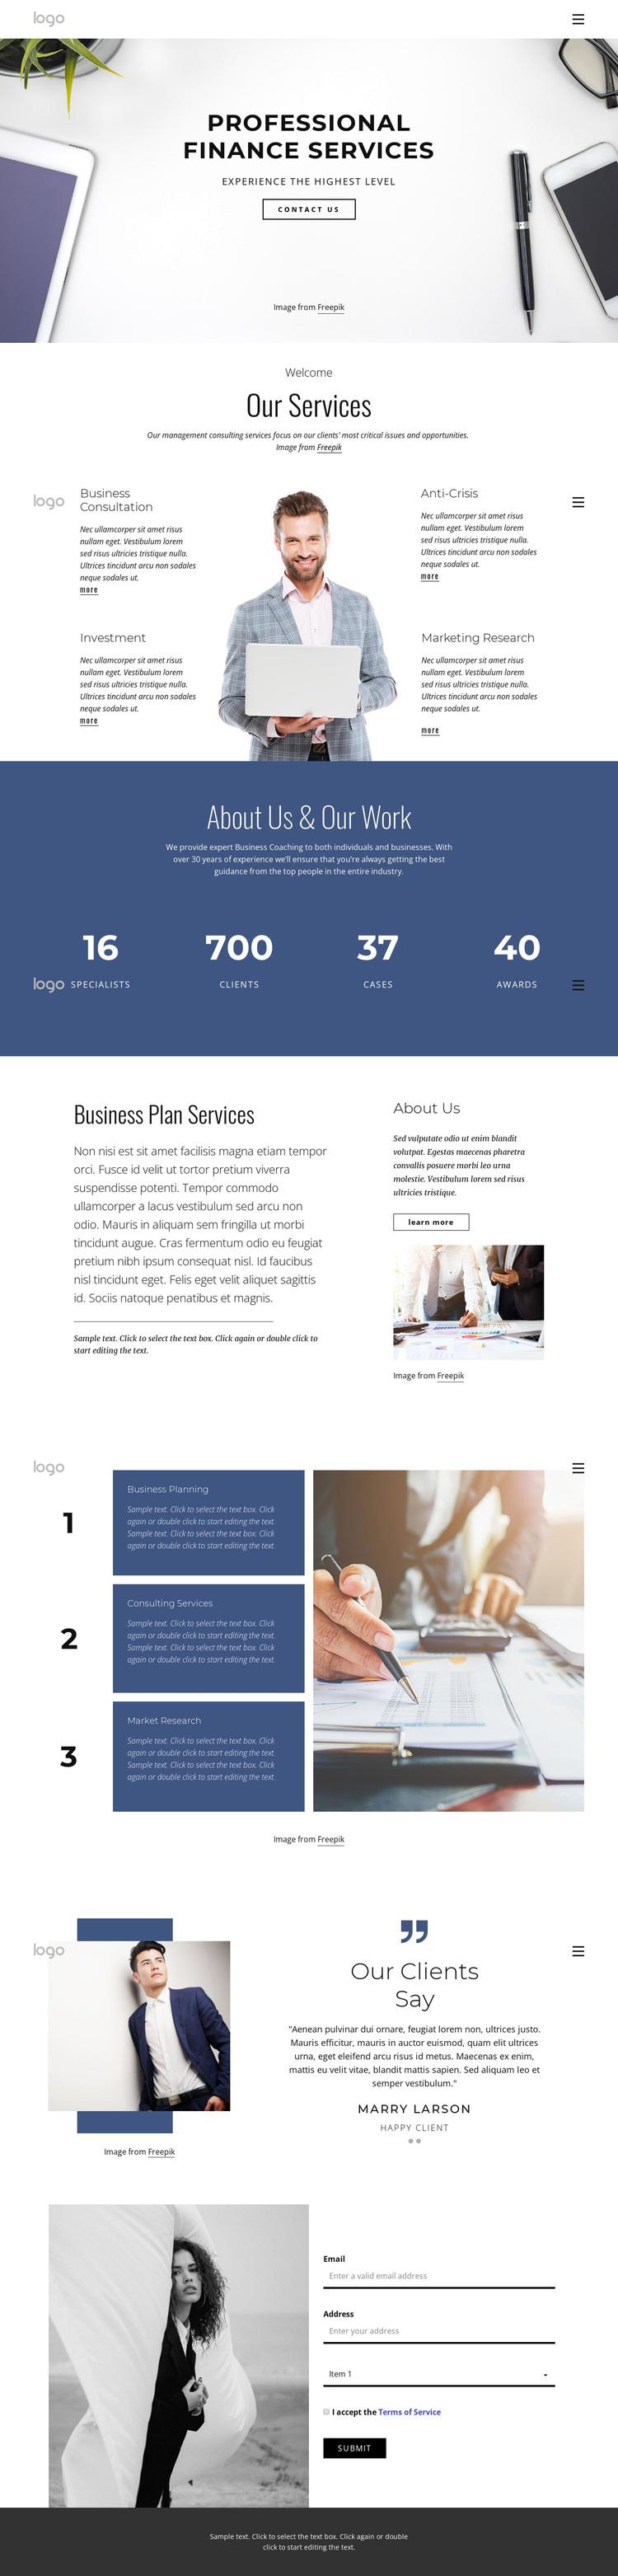 Professional finance services Joomla Page Builder